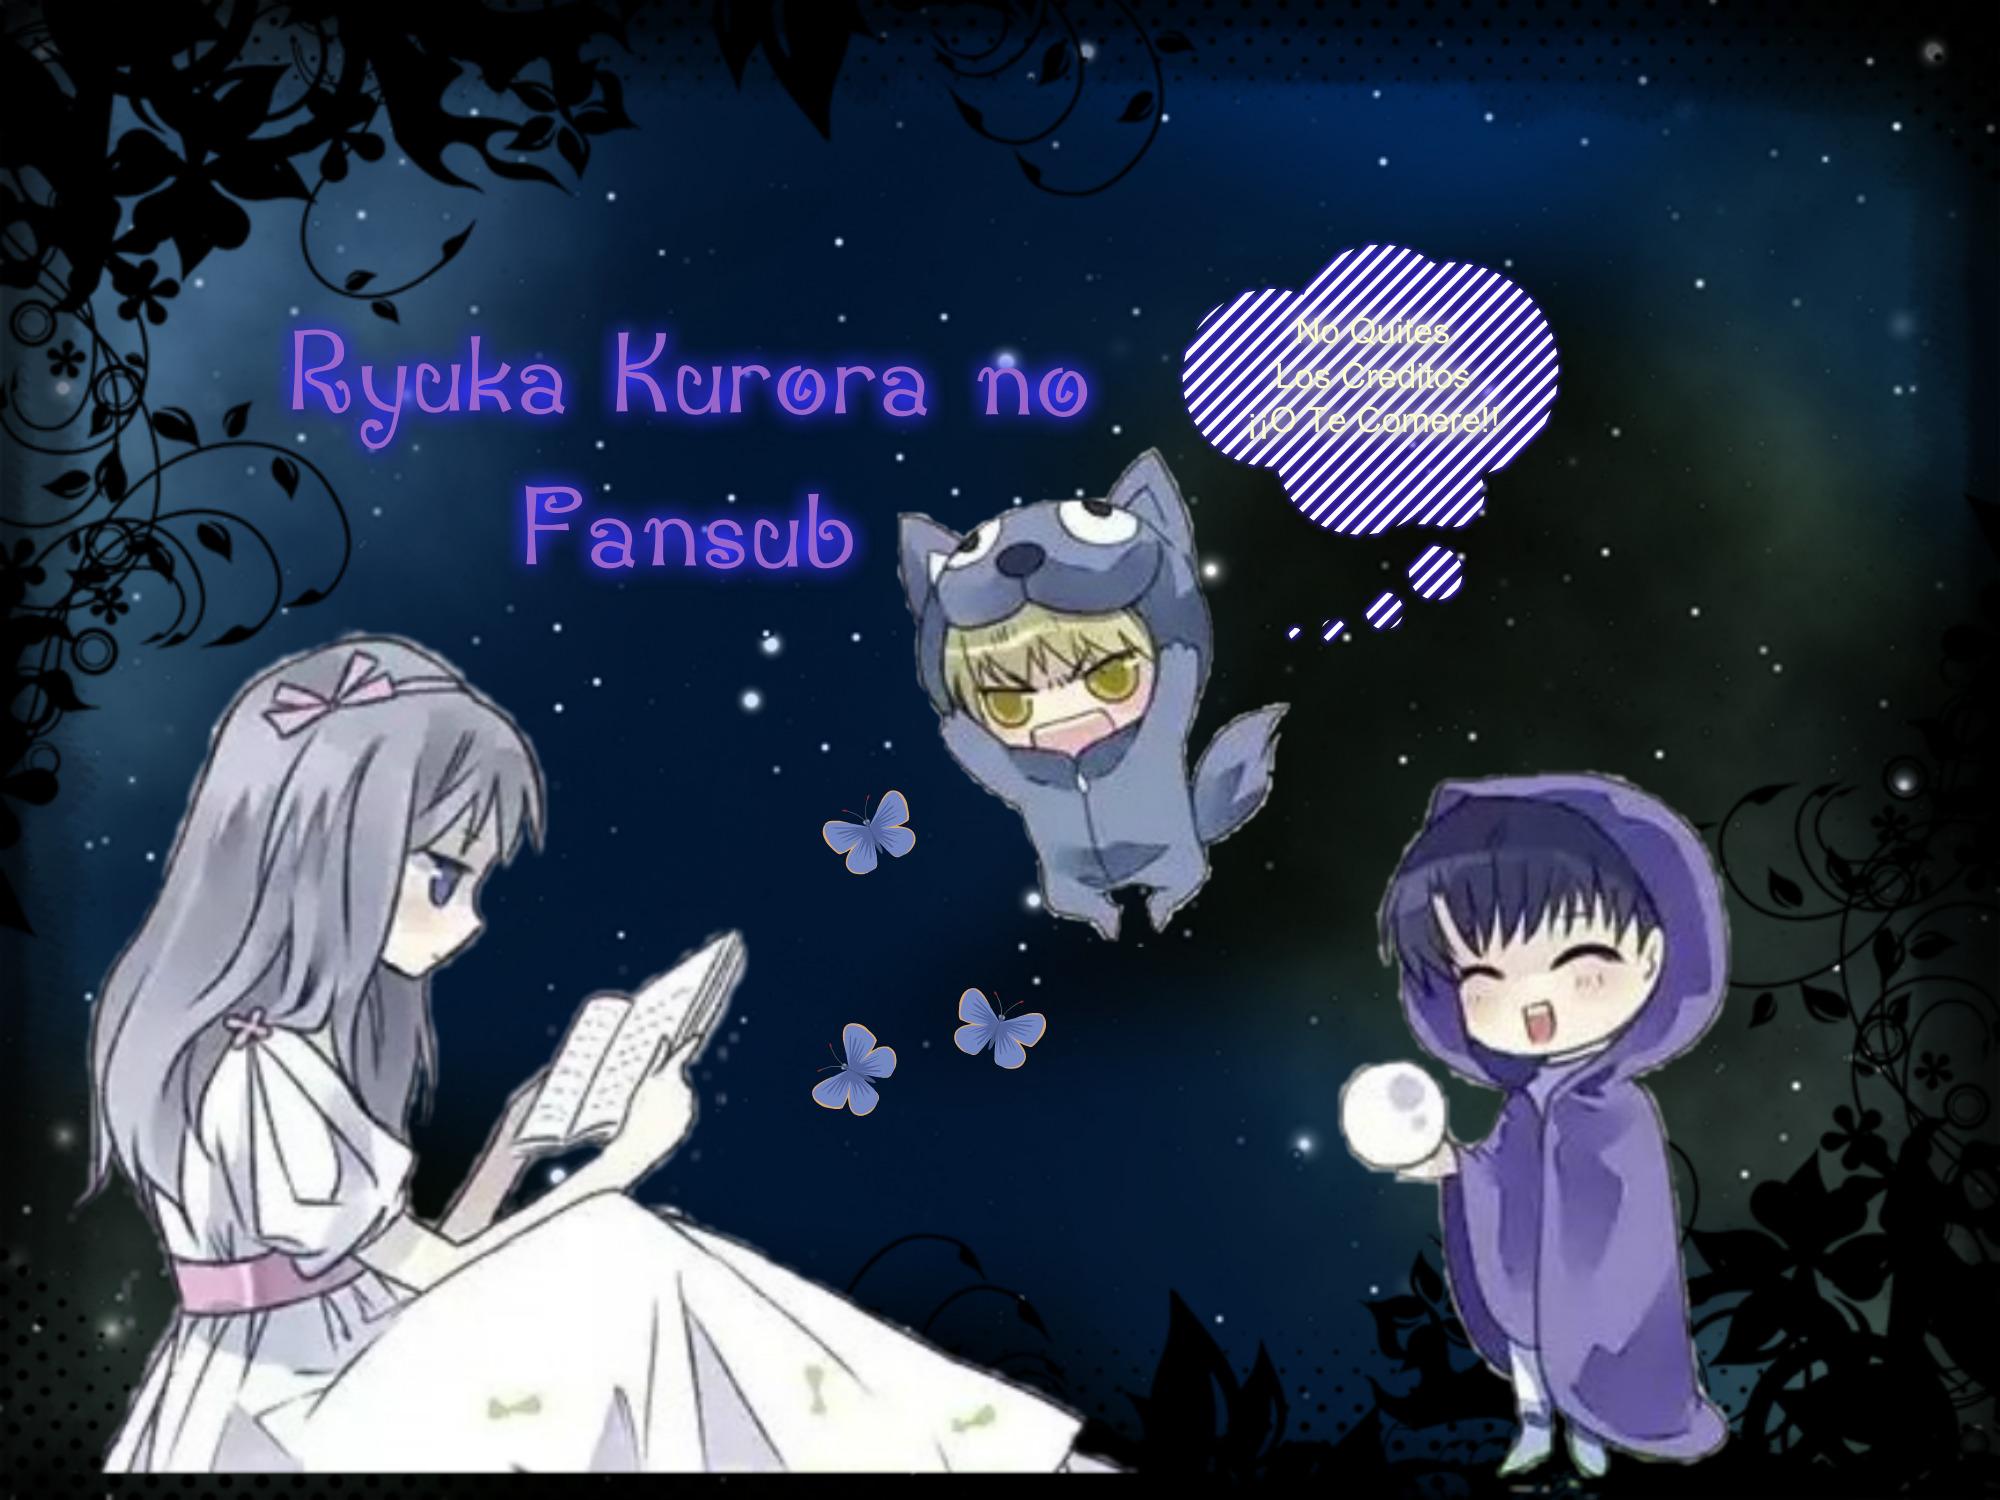 http://c5.ninemanga.com/es_manga/4/836/396228/dfee497df1c34a2f74da2fa60888fa04.jpg Page 1